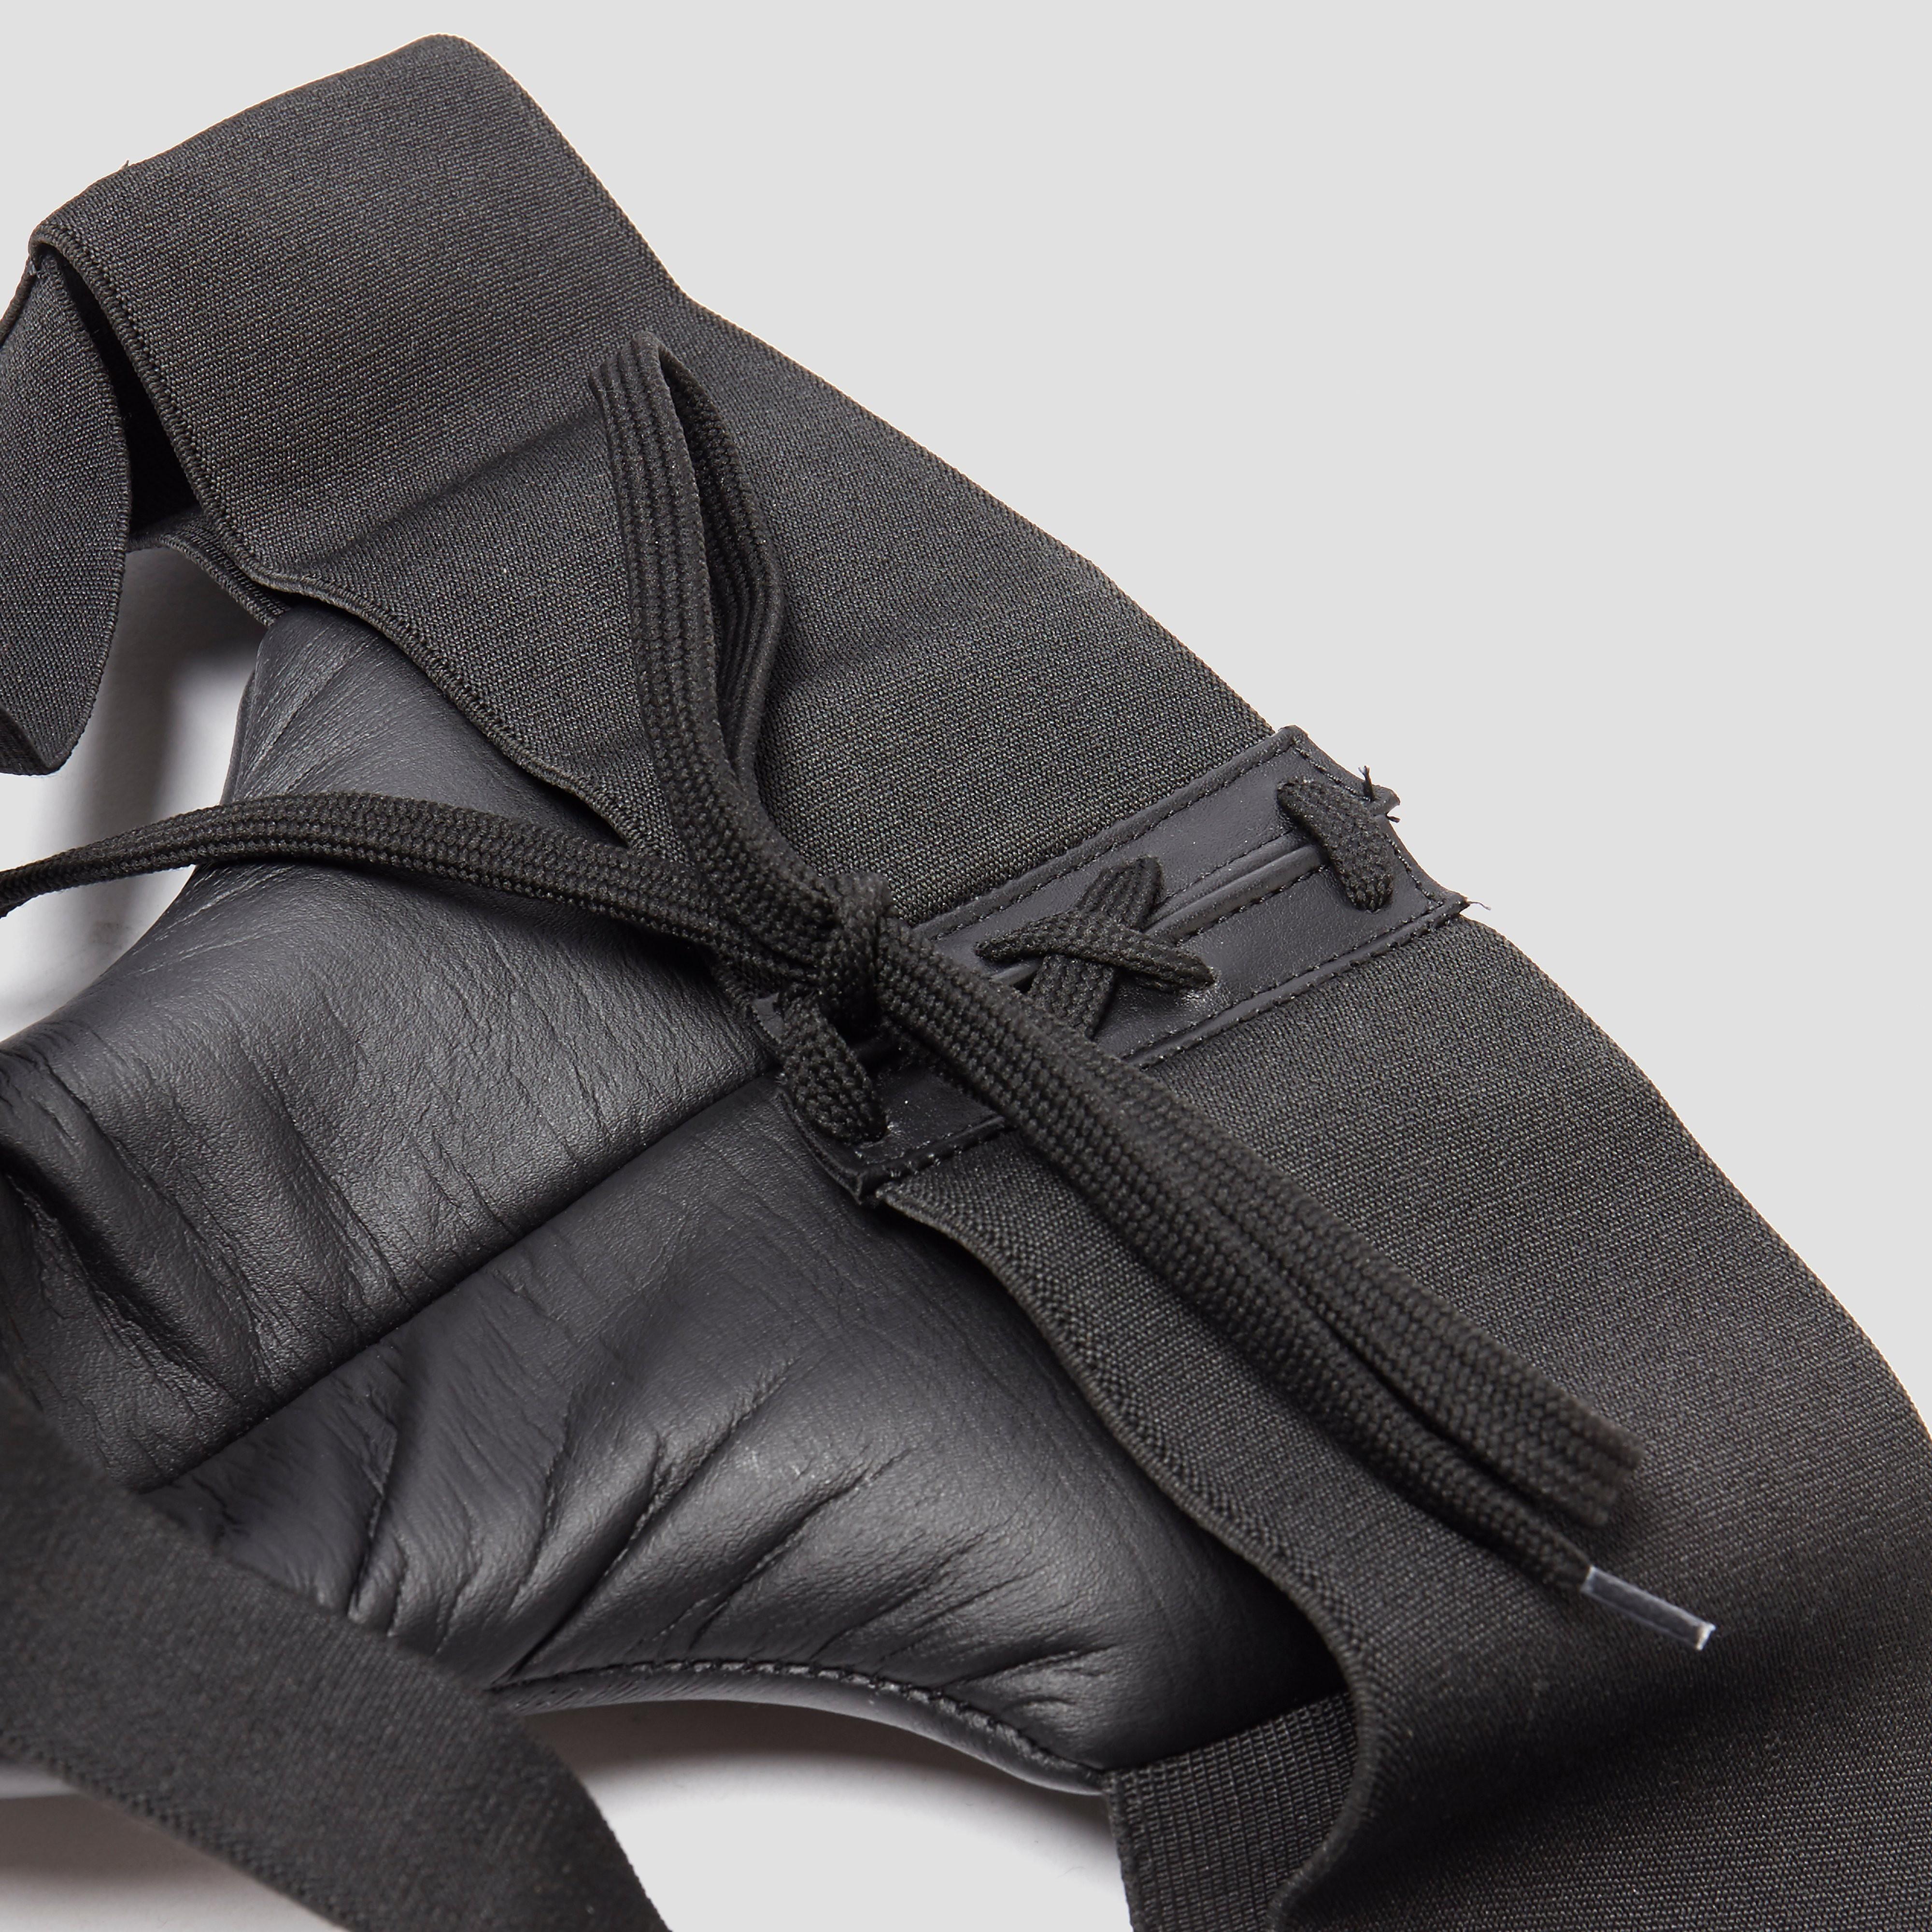 RDX INC Leather-X Men's Groin Guard Protector